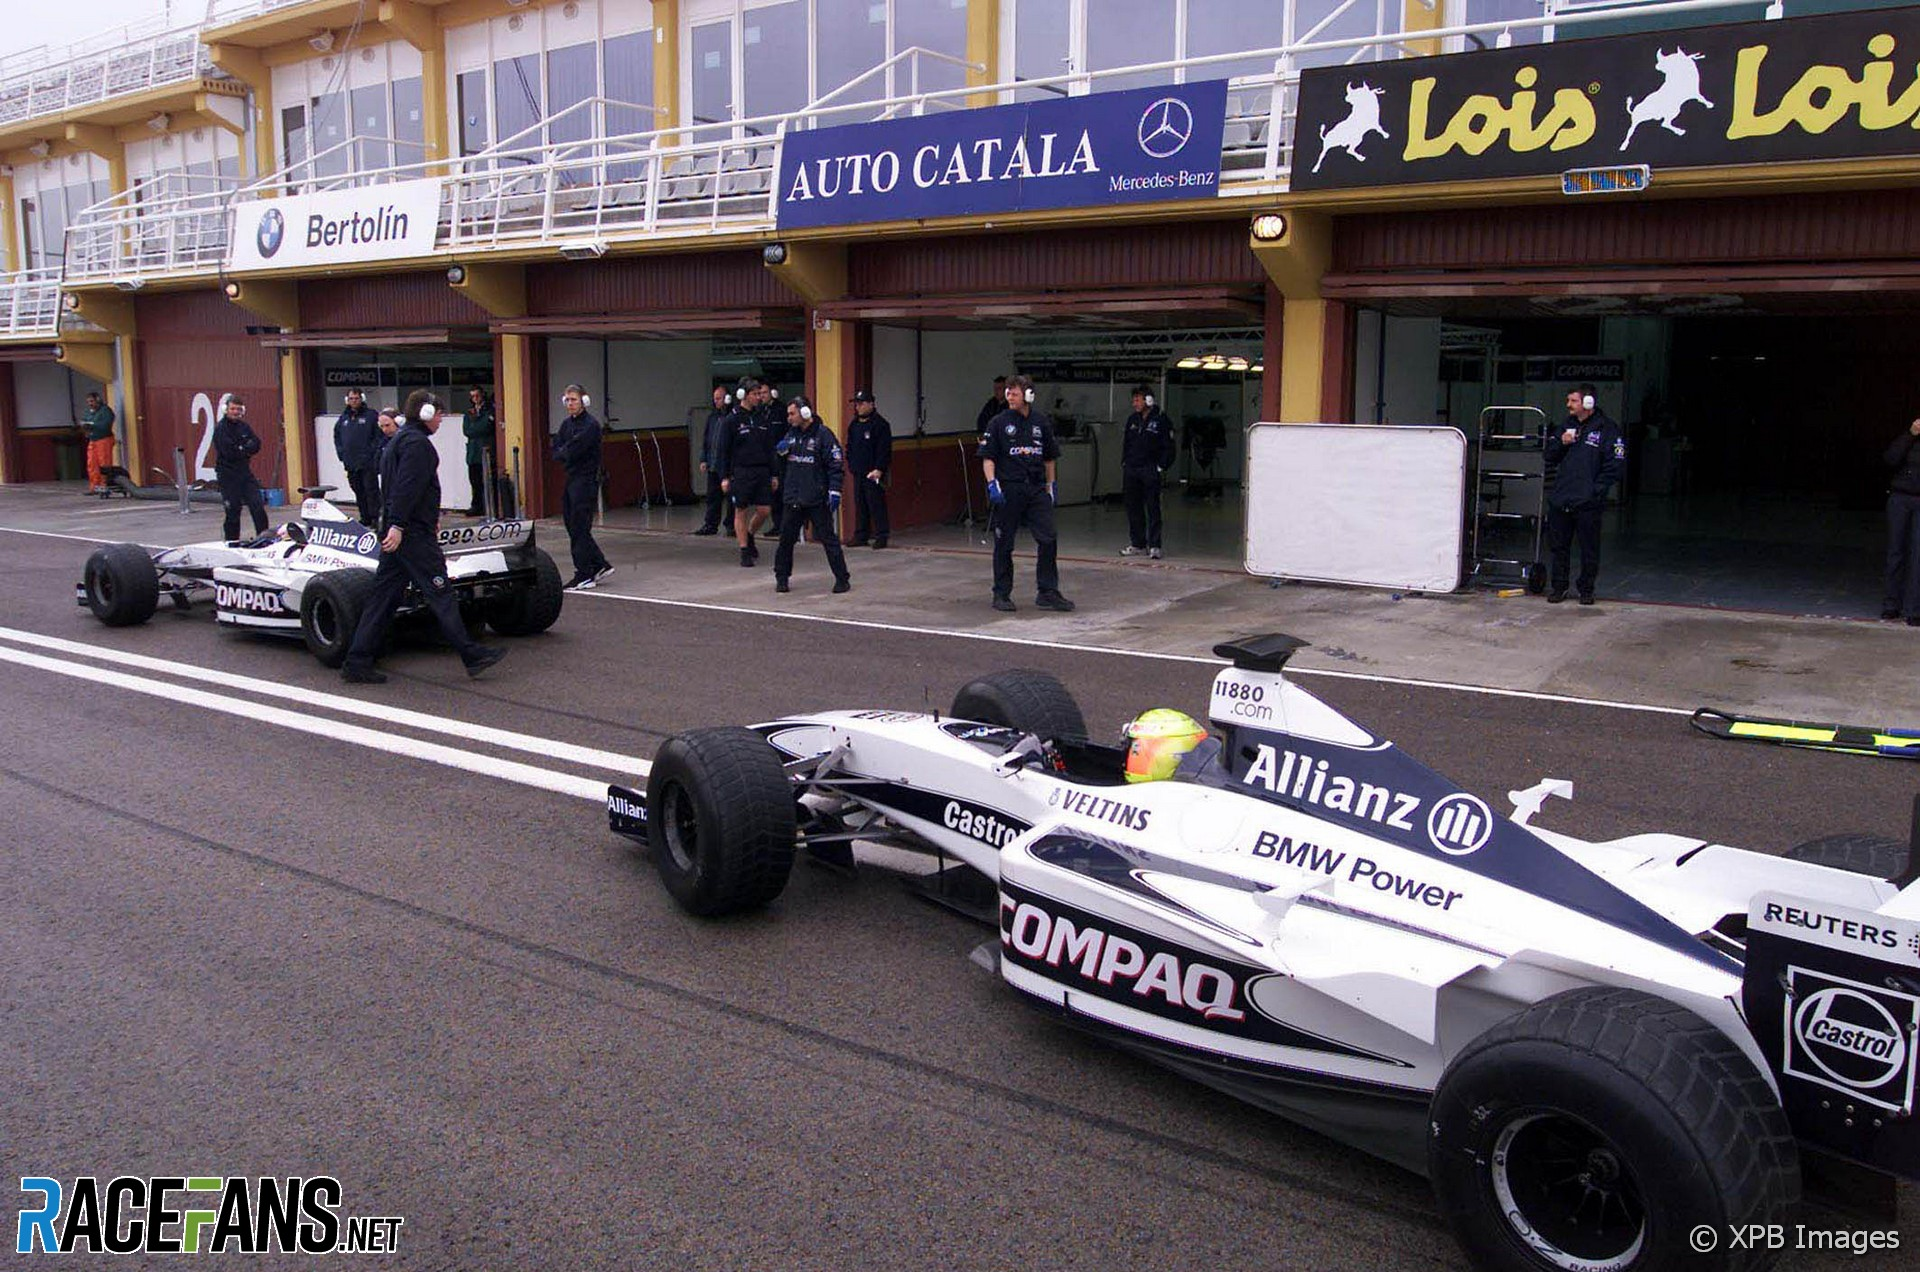 Juan Pablo Montoya, Ralf Schumacher, Williams, Valencia, 2001